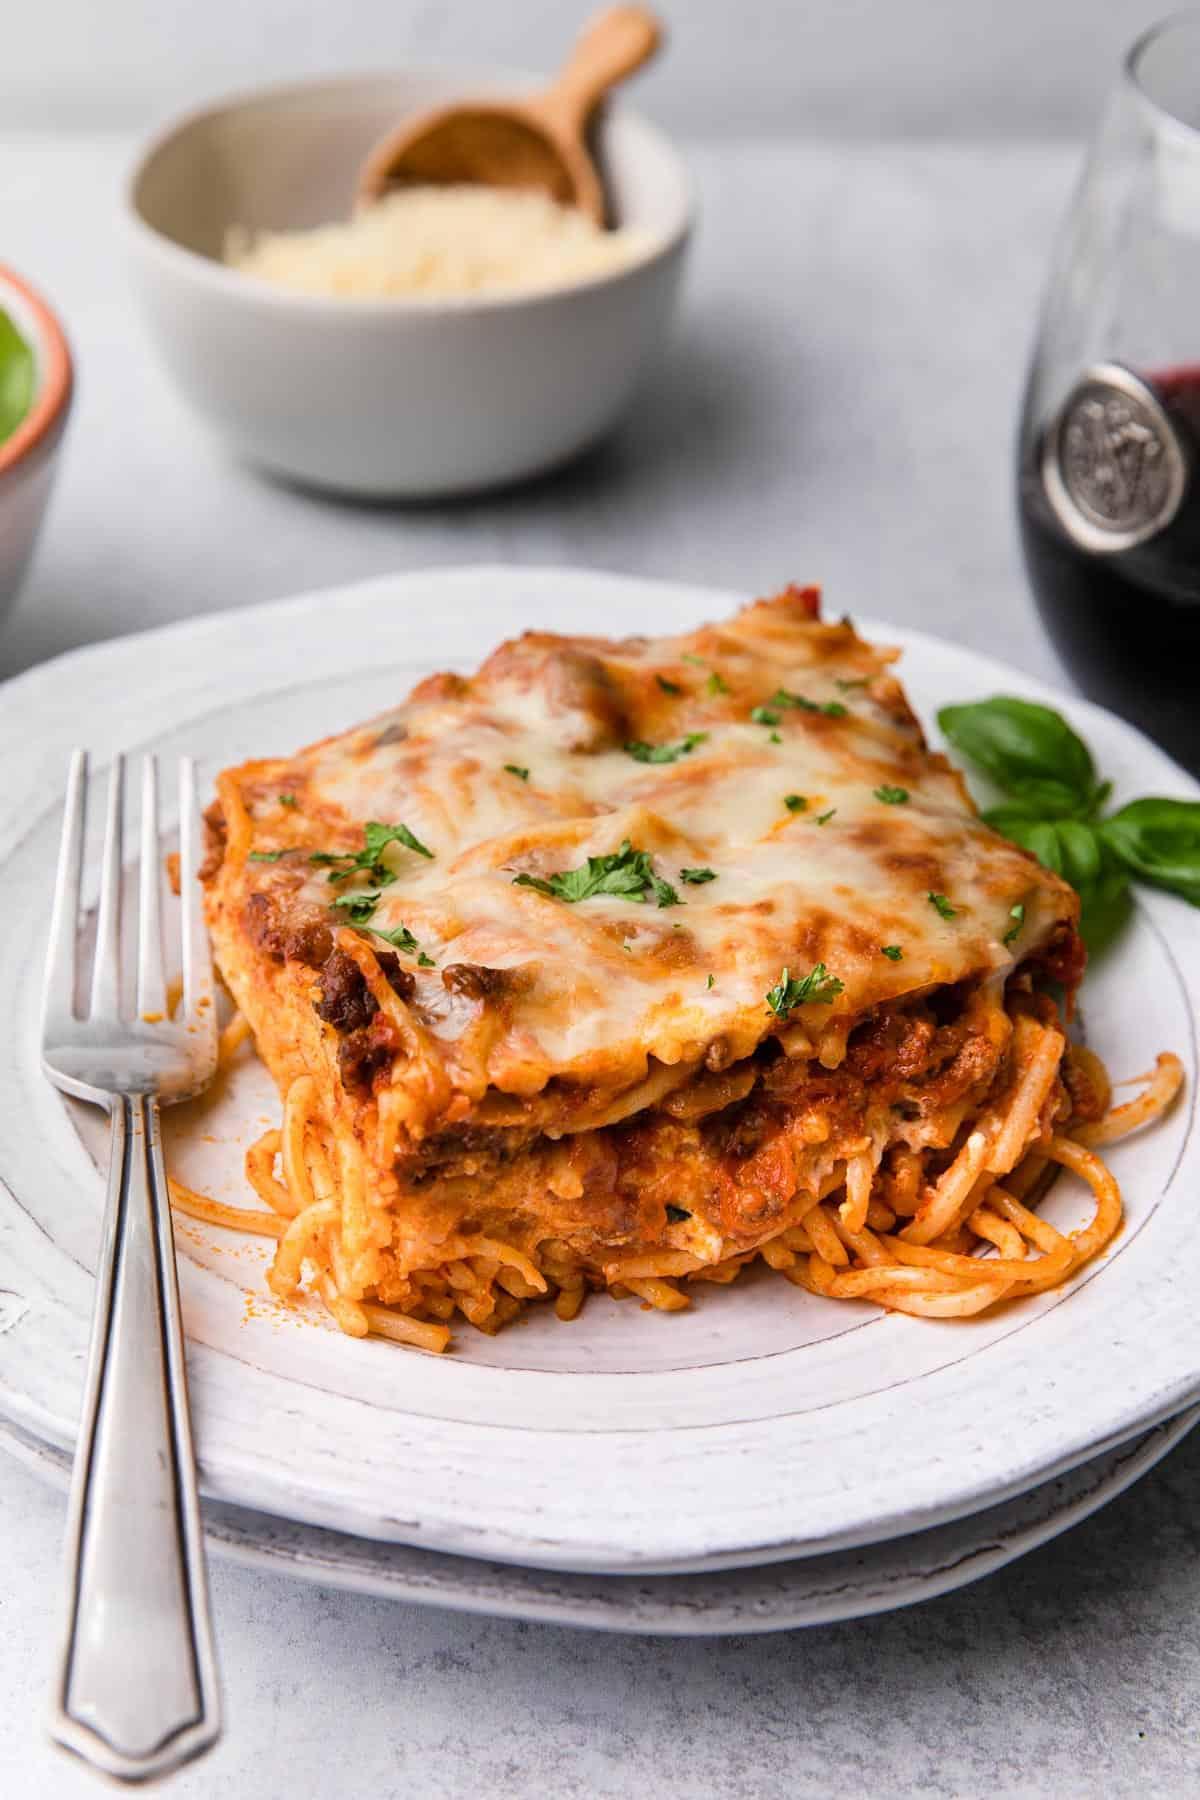 A piece of spaghetti casserole on a plate.